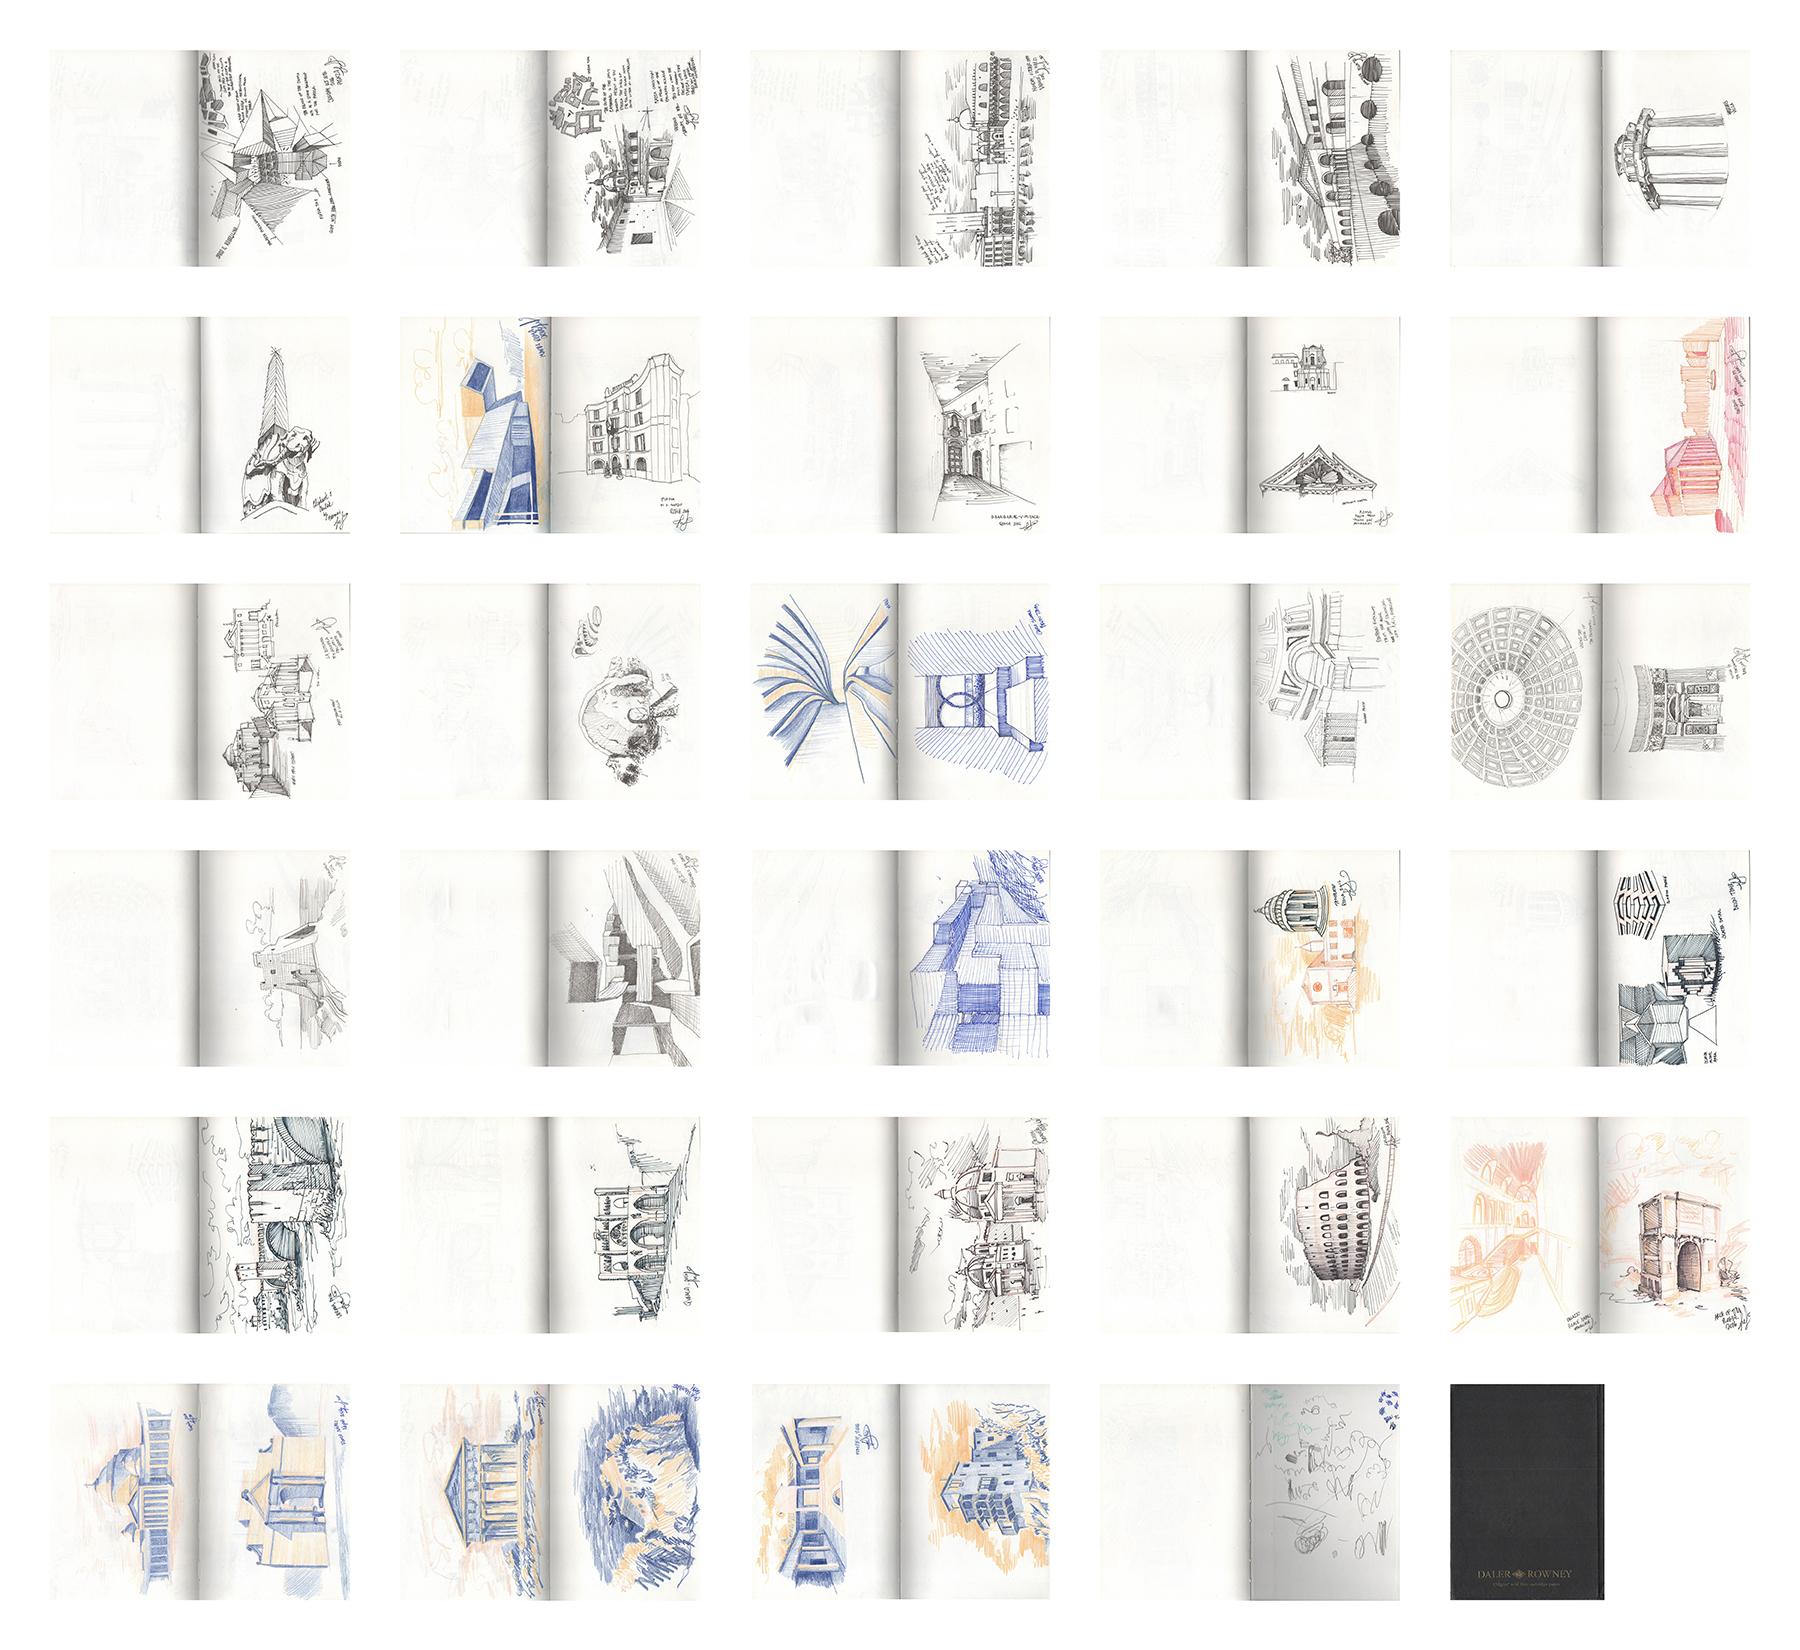 Rome Sketchbook All Pages2.jpg